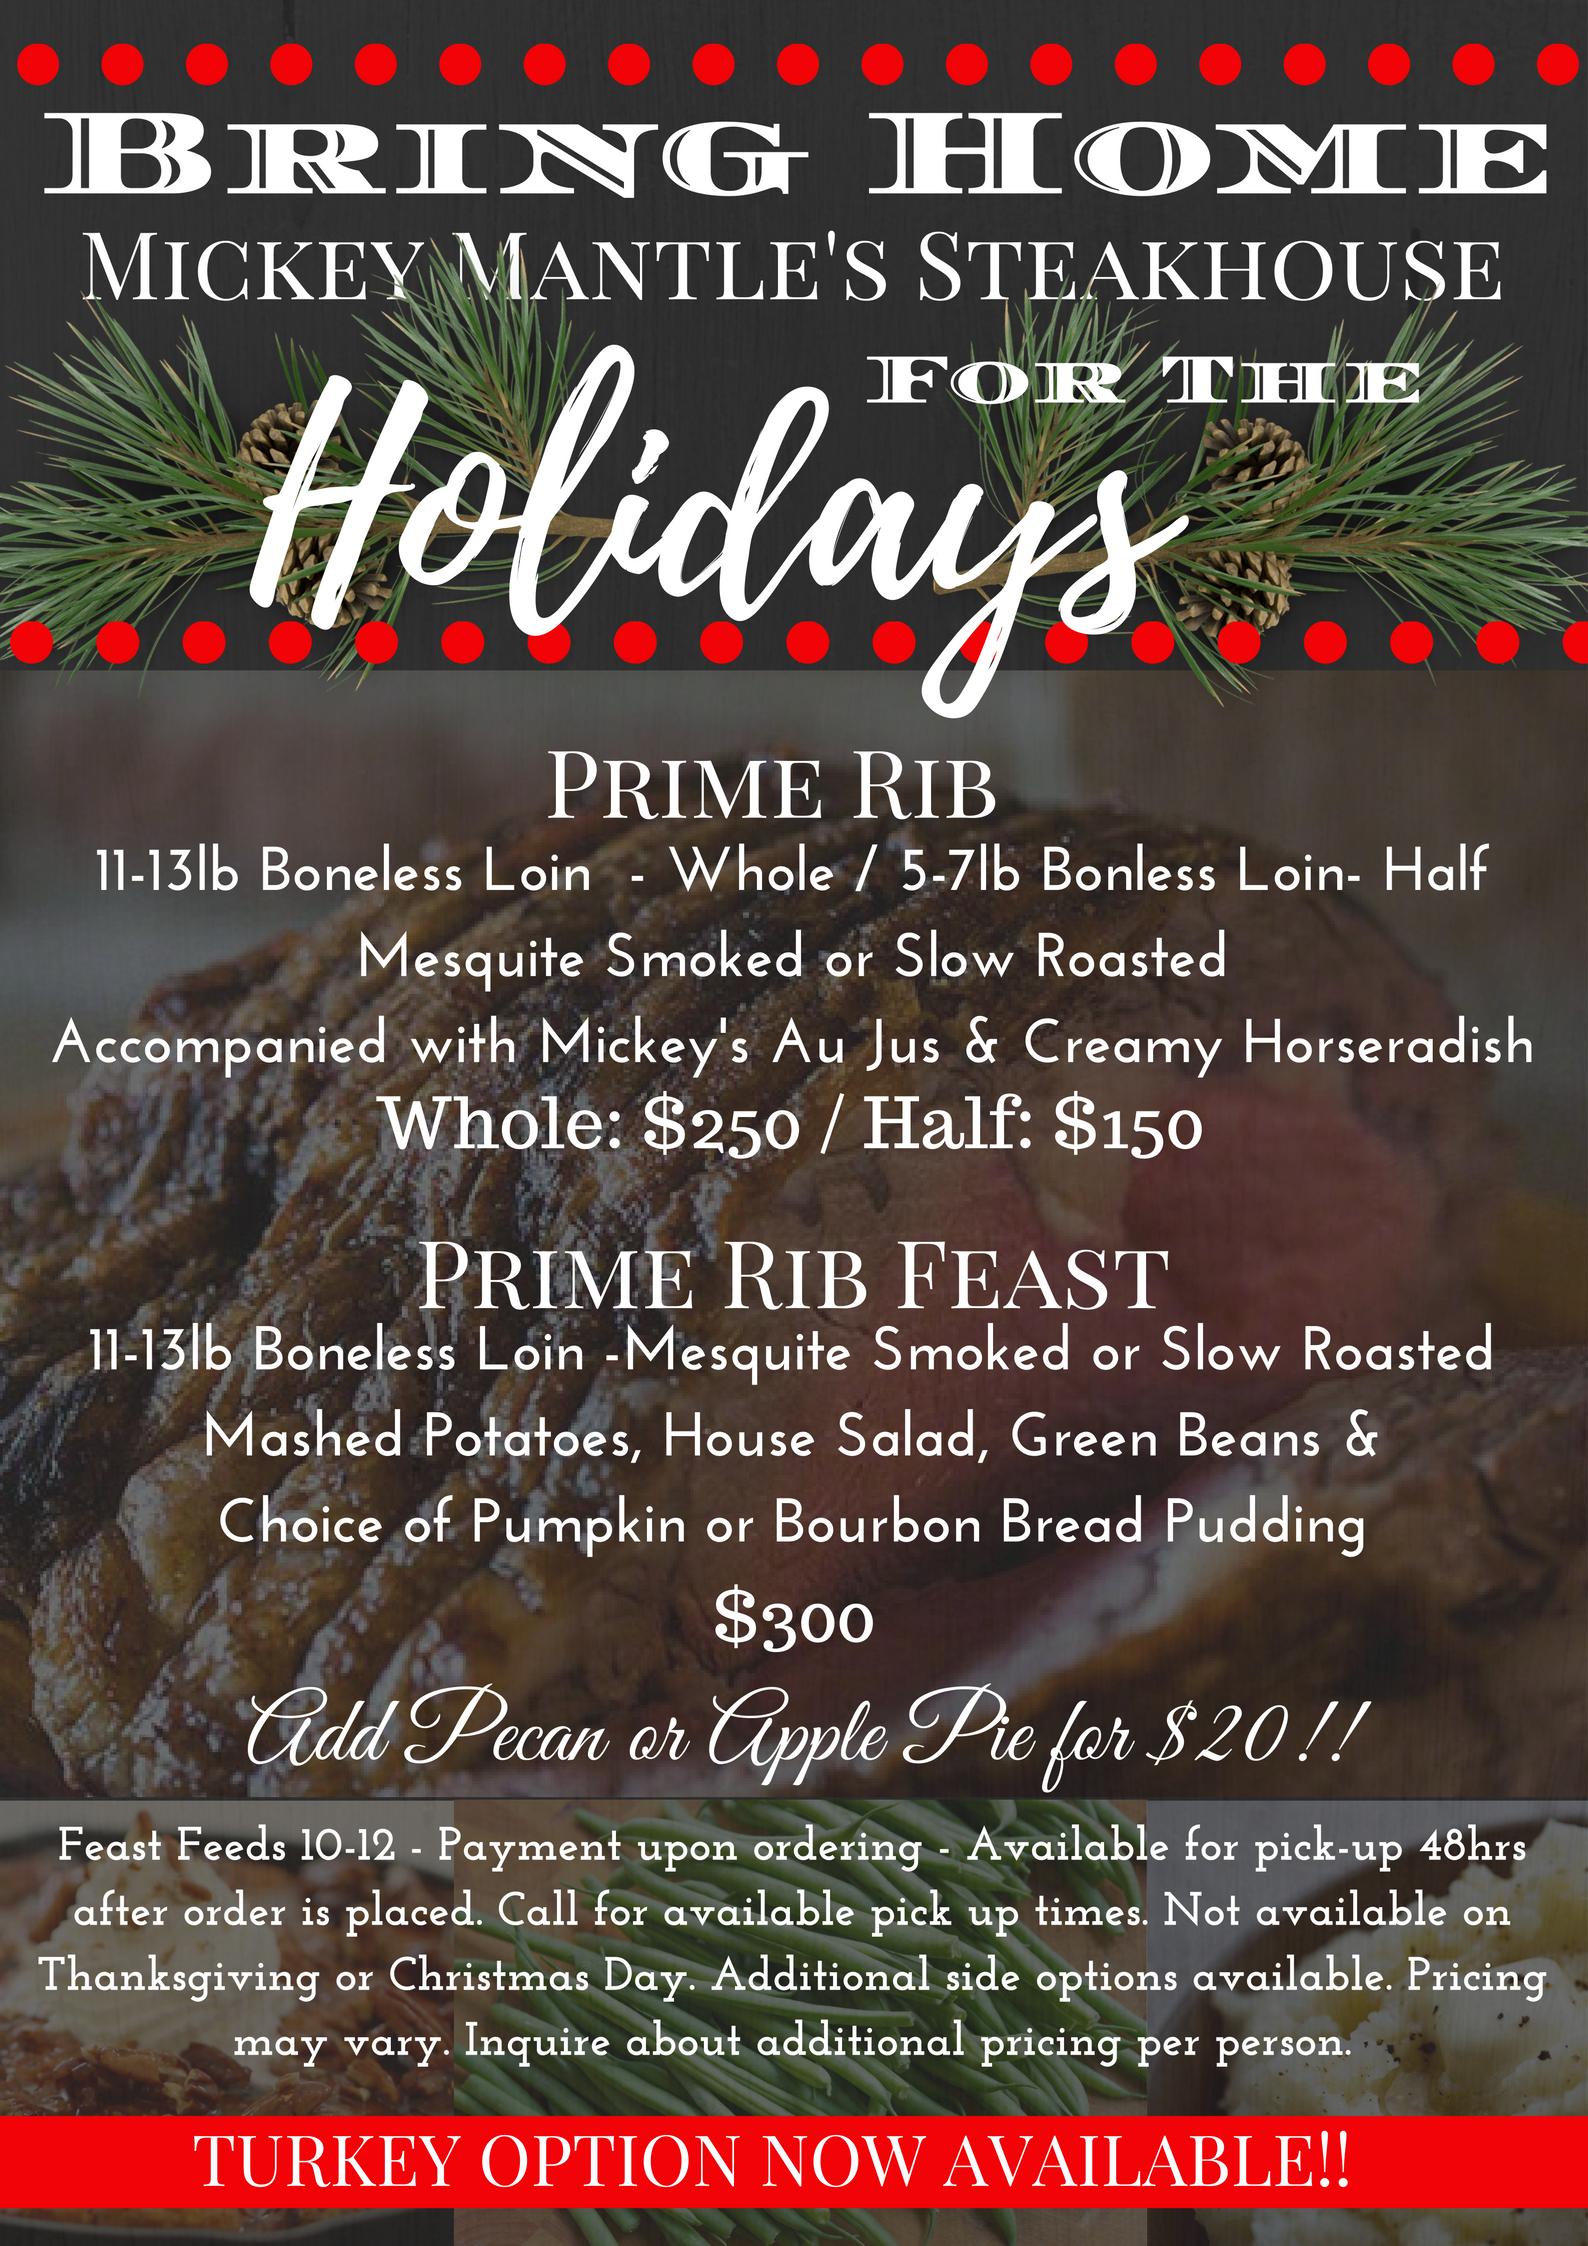 Prime Rib Feast